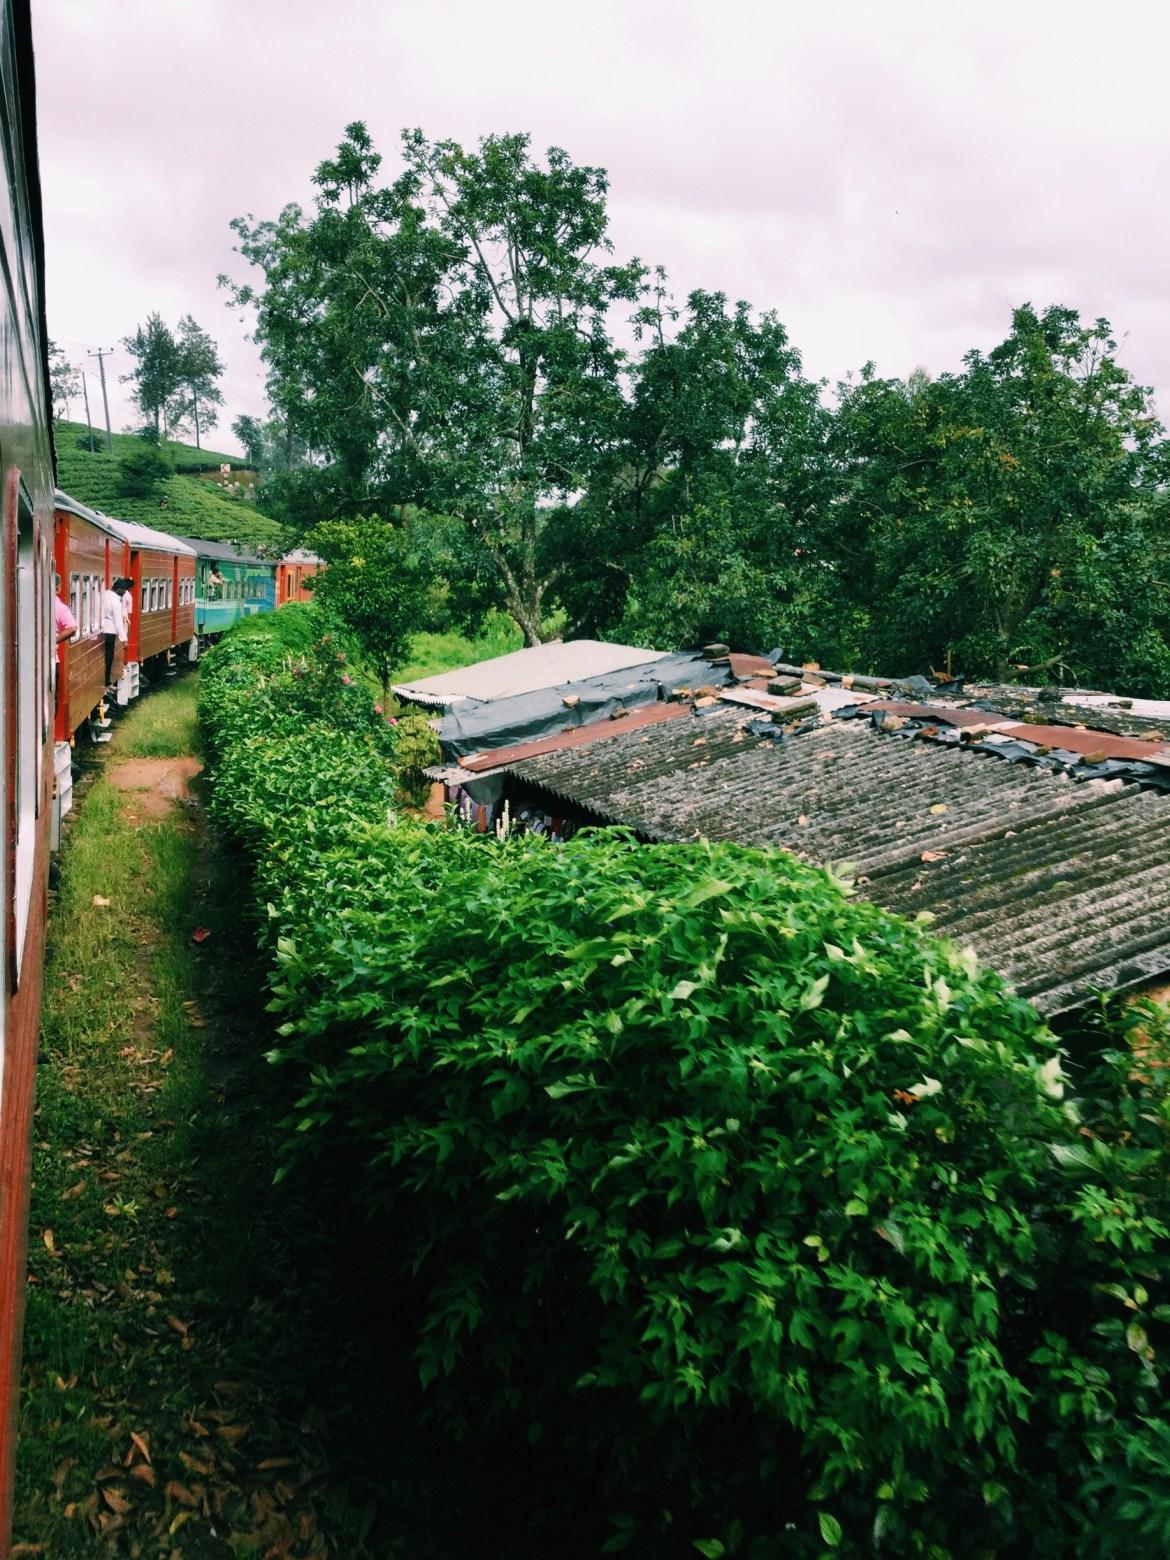 Sri Lanka Train Colombo to Kandy